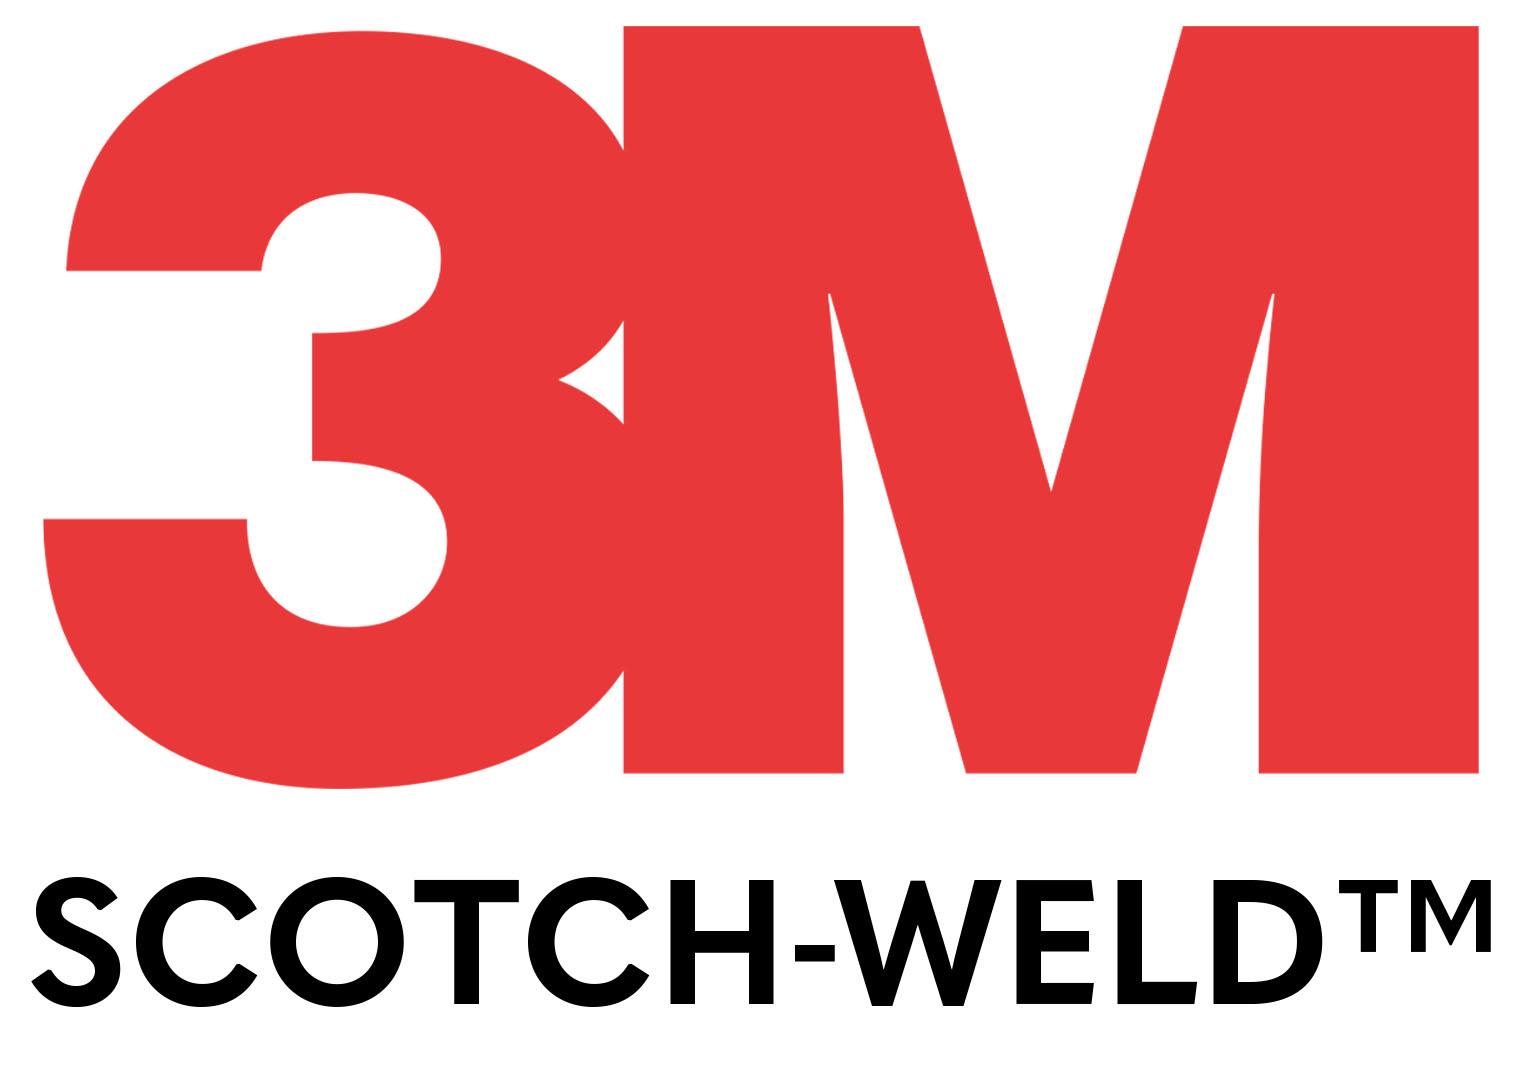 Scotch-Weld™